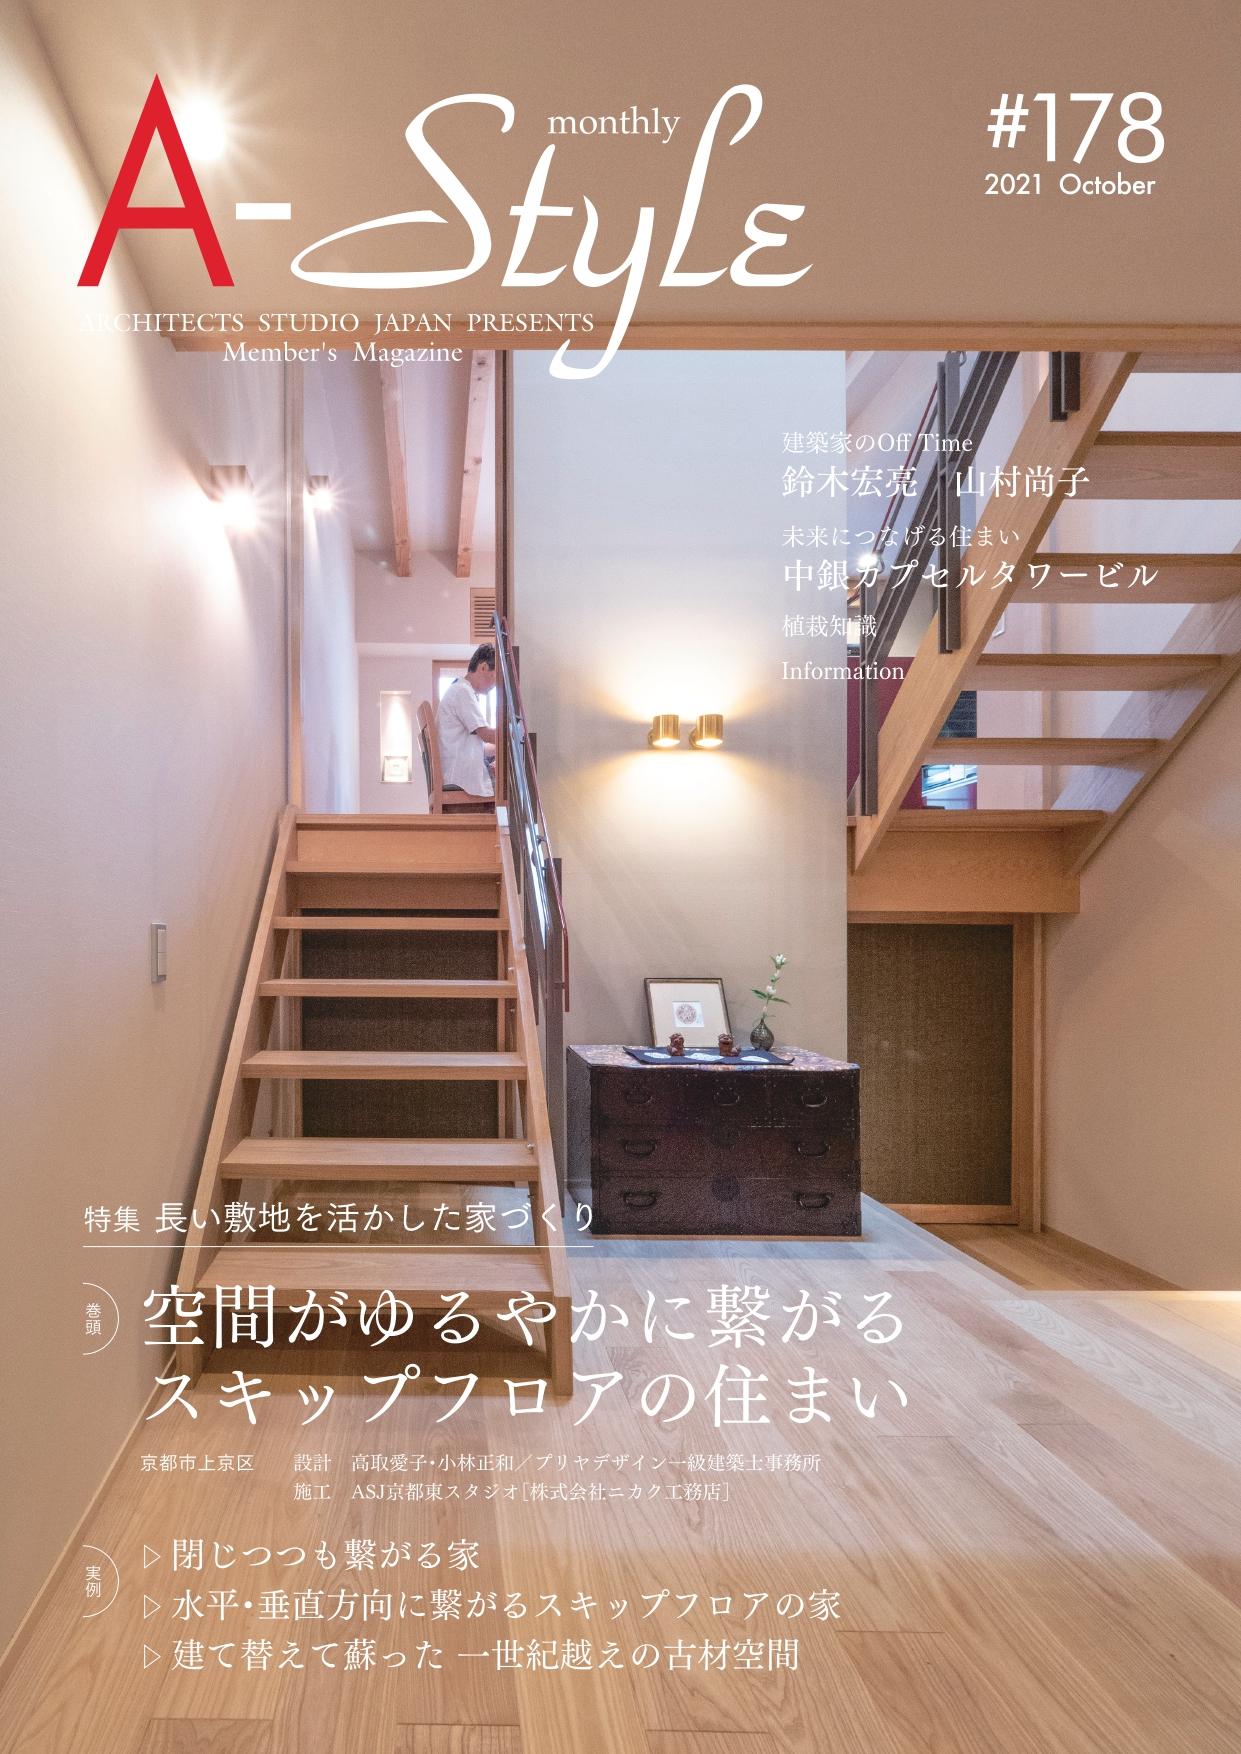 ASJ 情報誌 A-Style 178 号の表紙